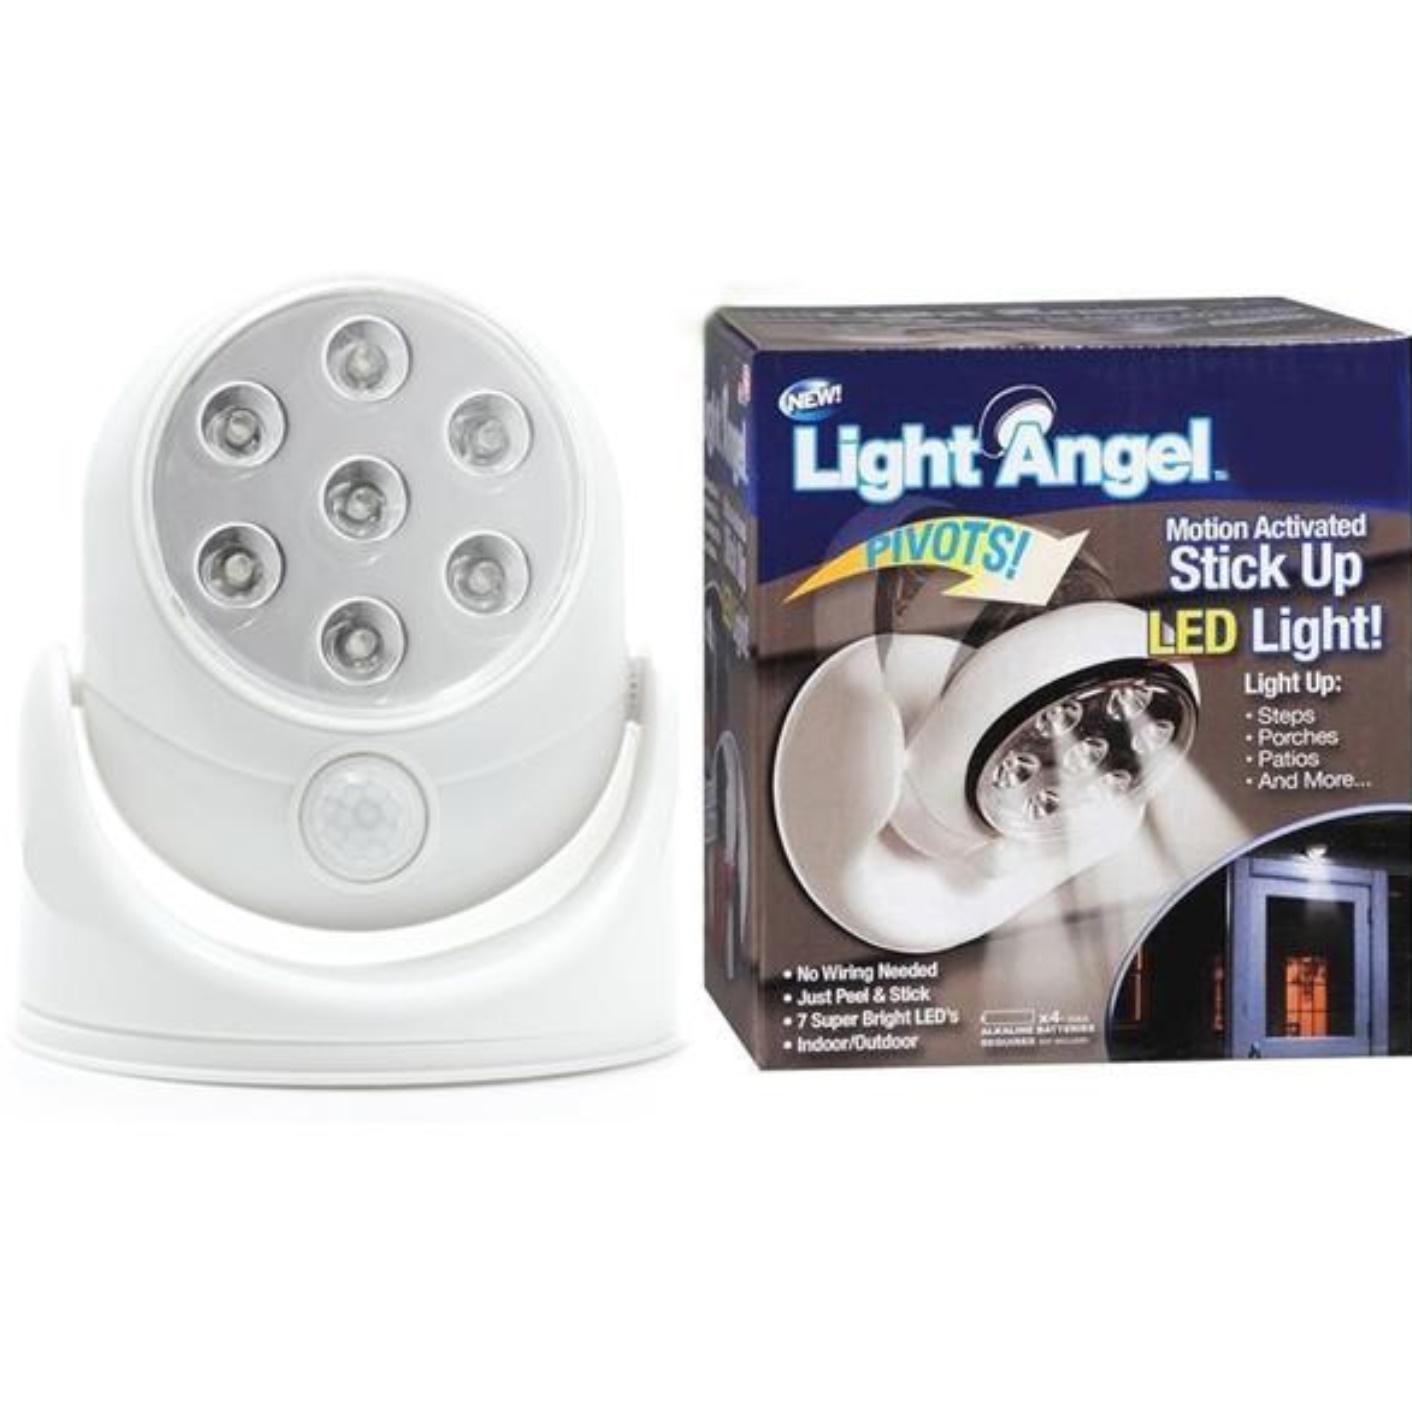 Bec cu senzor de miscare fara fir - 7 leduri Light Angel 360 grade